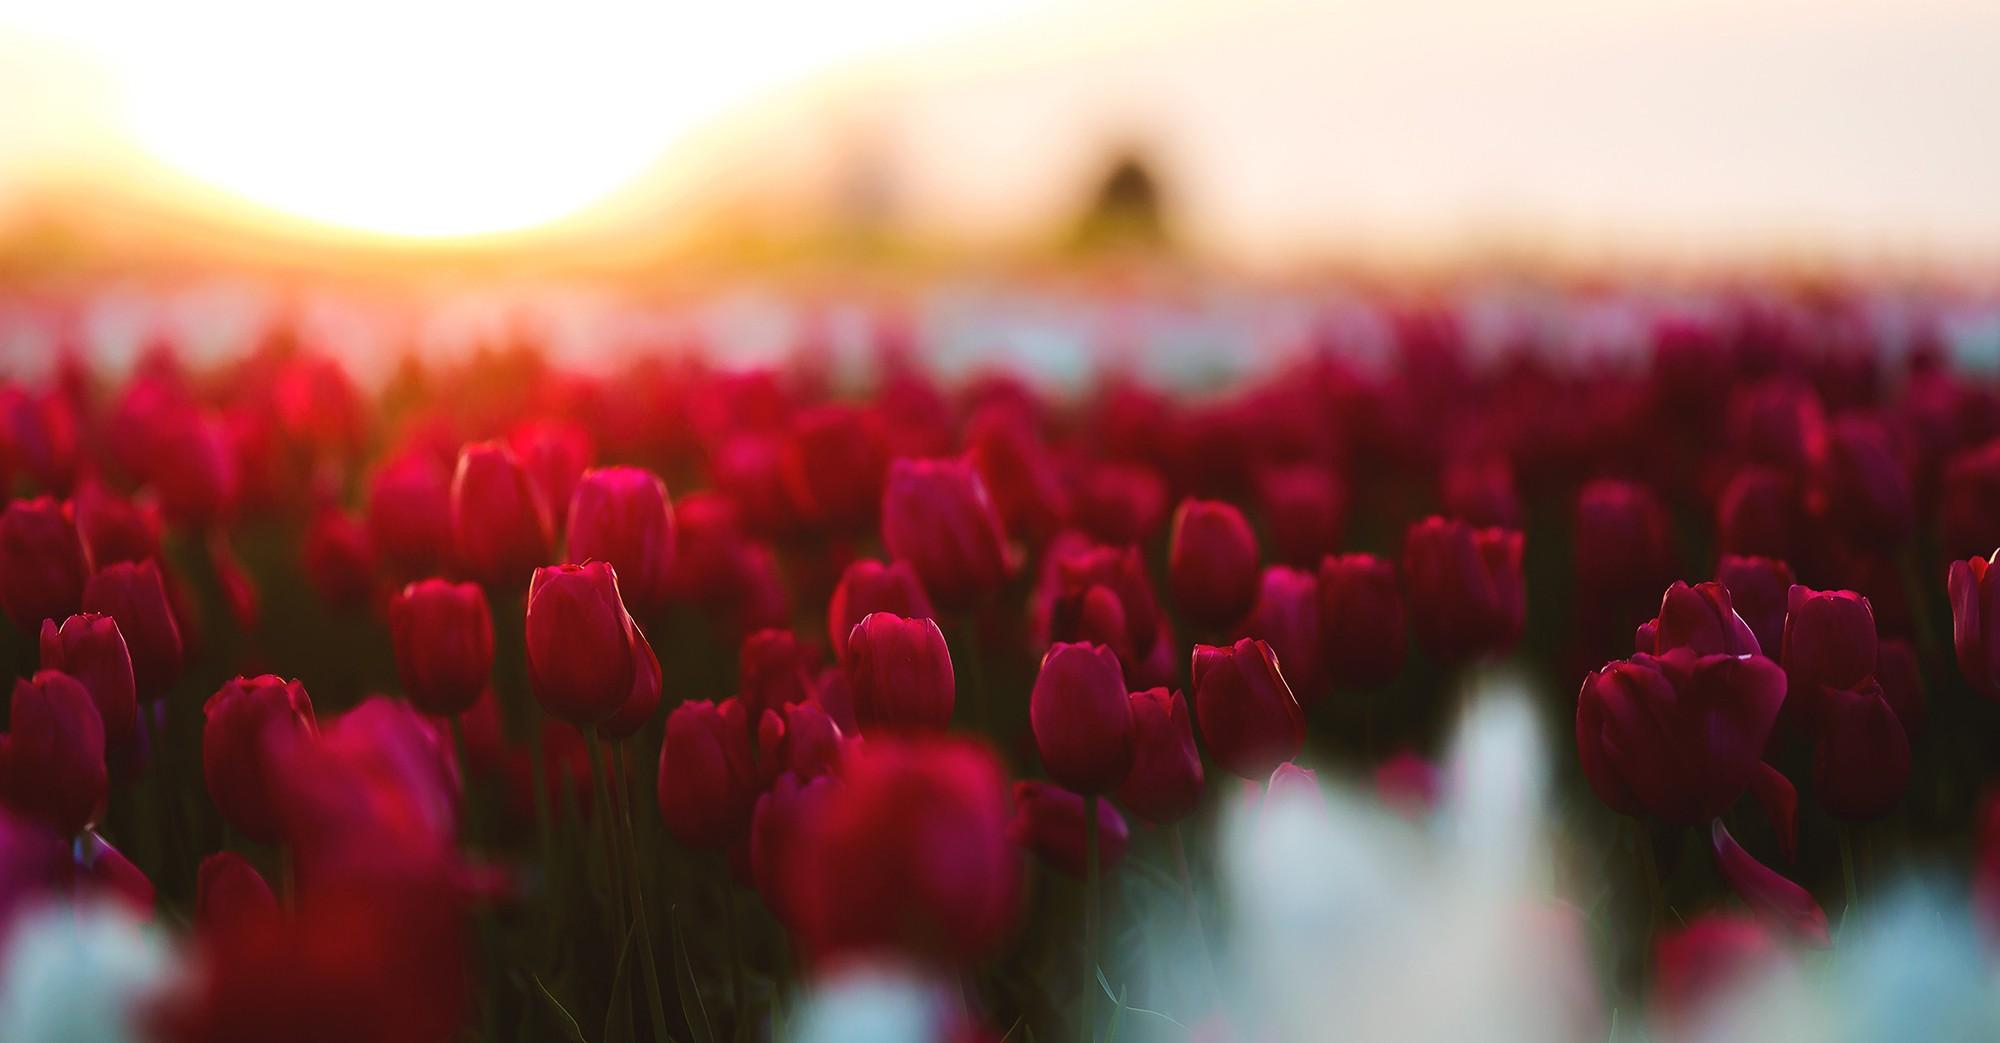 red flowers in a field